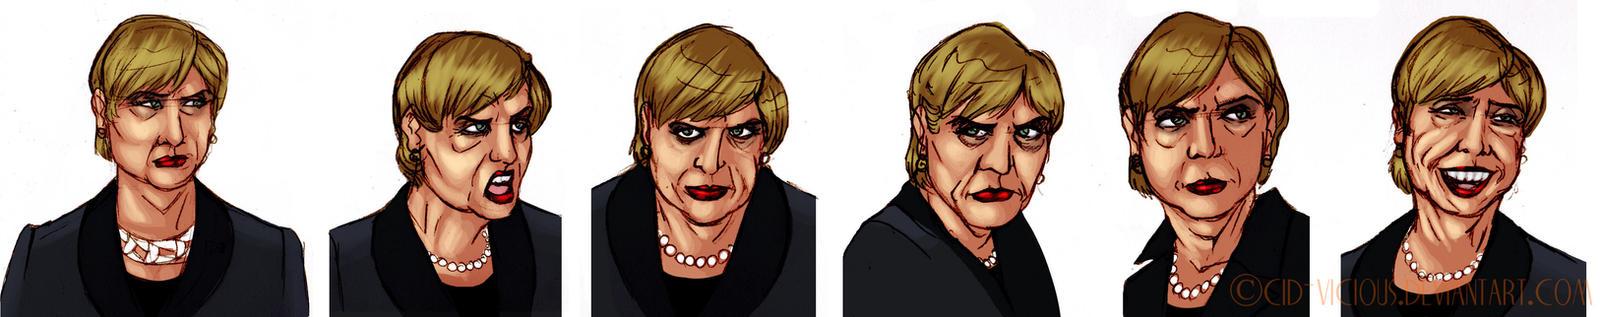 The Reichskanzlerin by Cid-Vicious